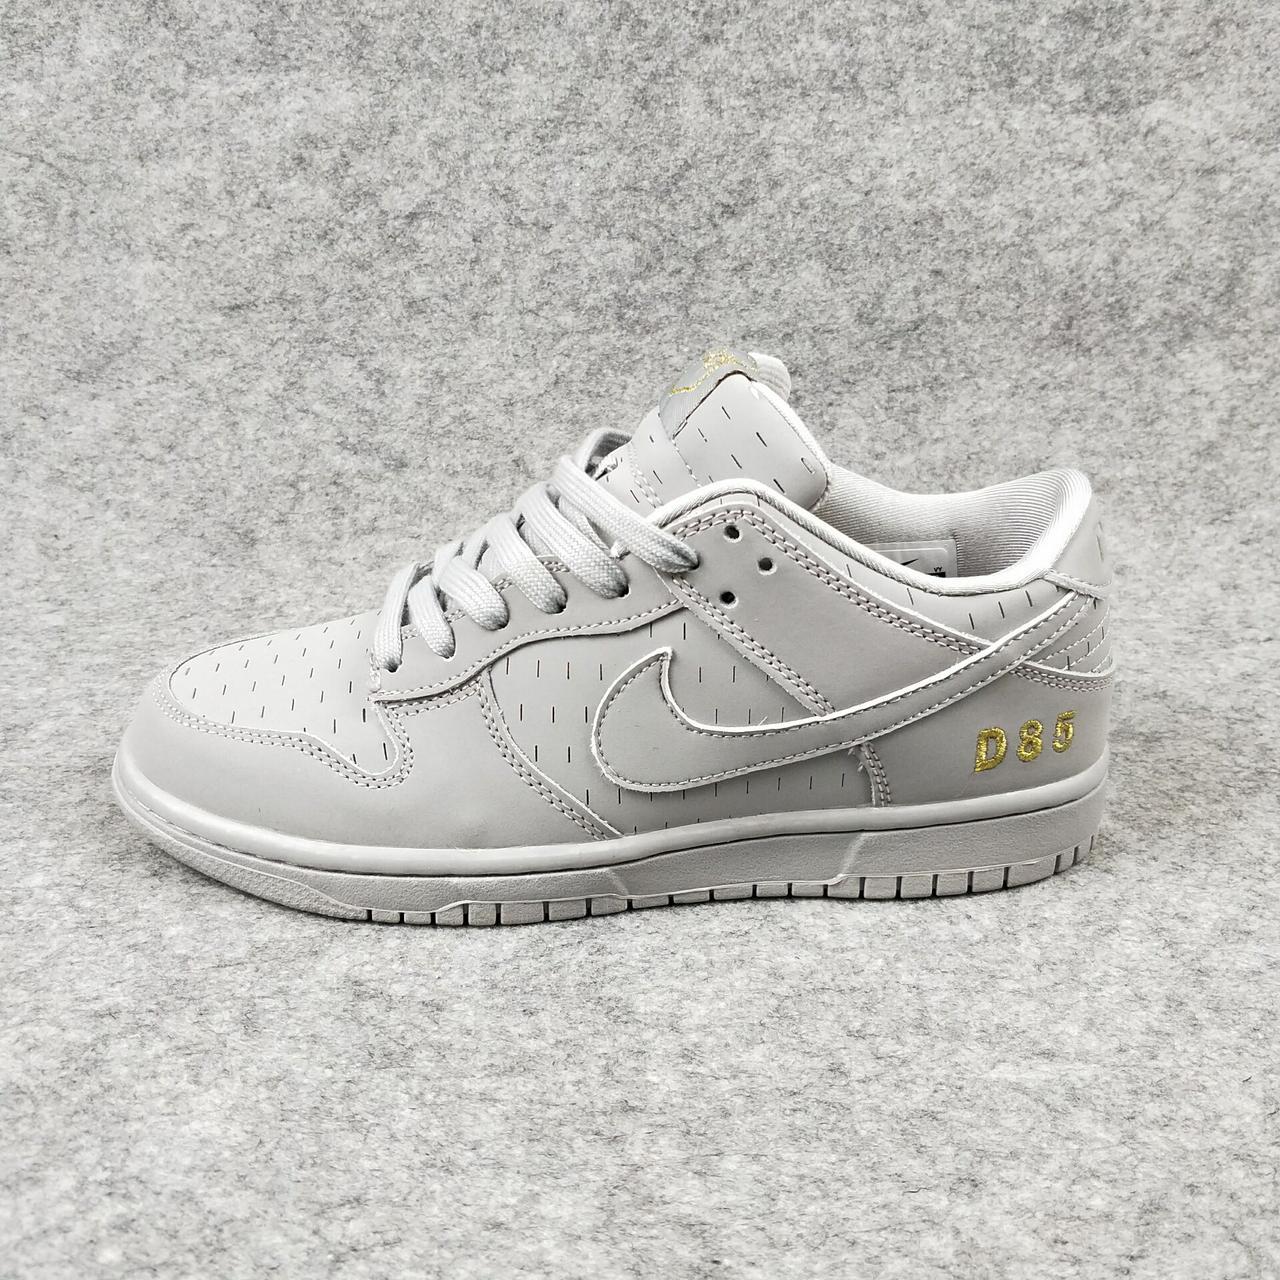 7799eb6a Кроссовки Nike SB Dunk Low Plattenbau найк реплика - Интернет-магазин  кроссовок